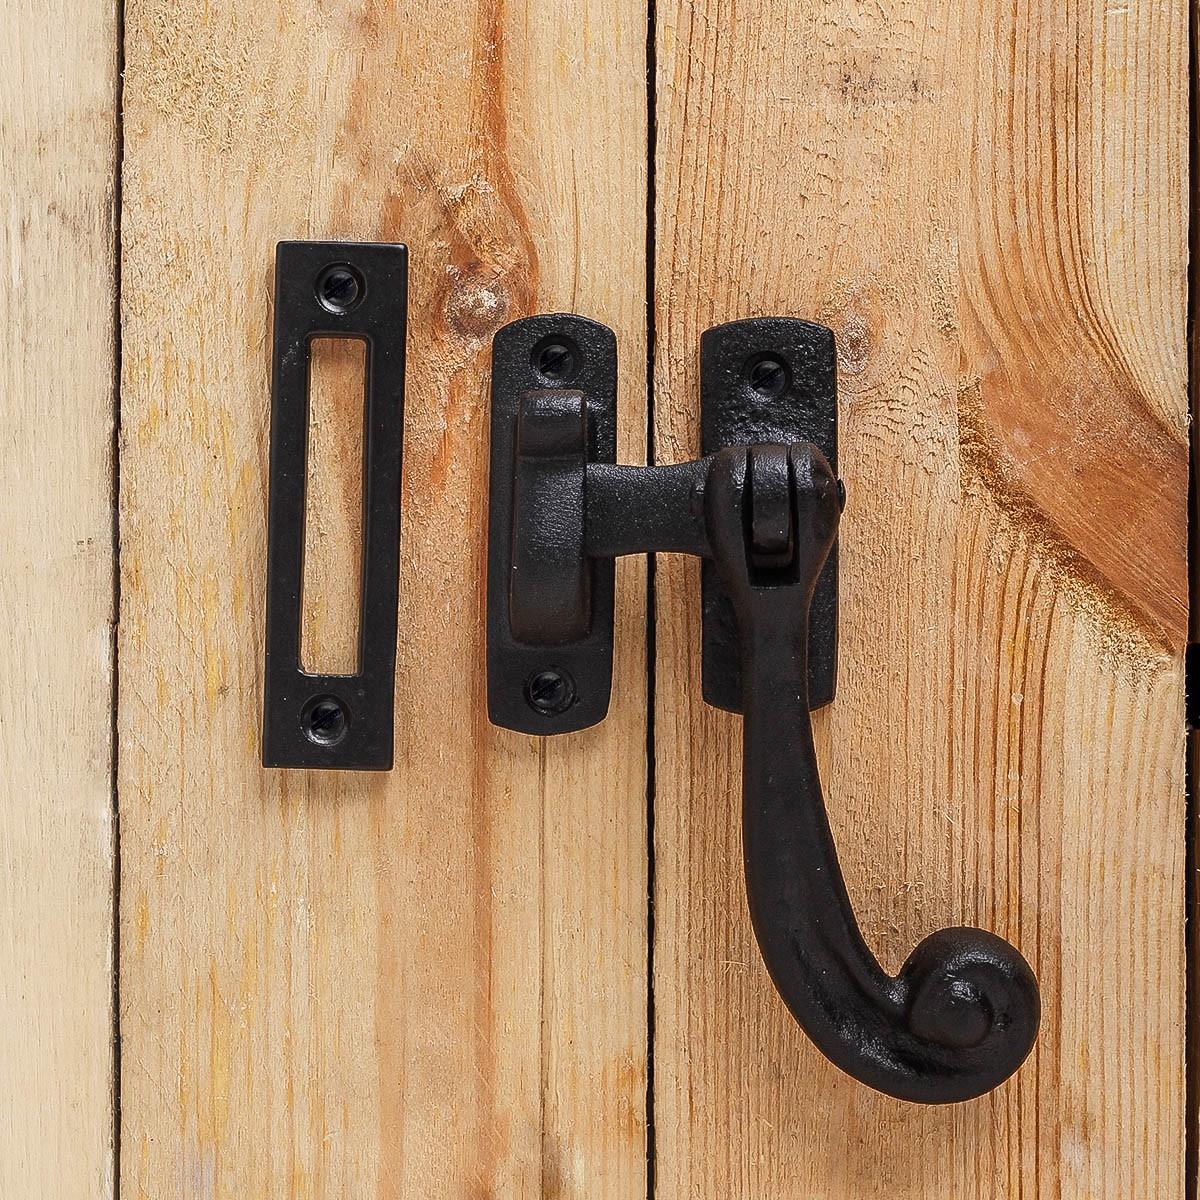 2 Sash Window Door Lock Black Wrought Iron 4 12 Window Pulls Window Lifts Sash Lift